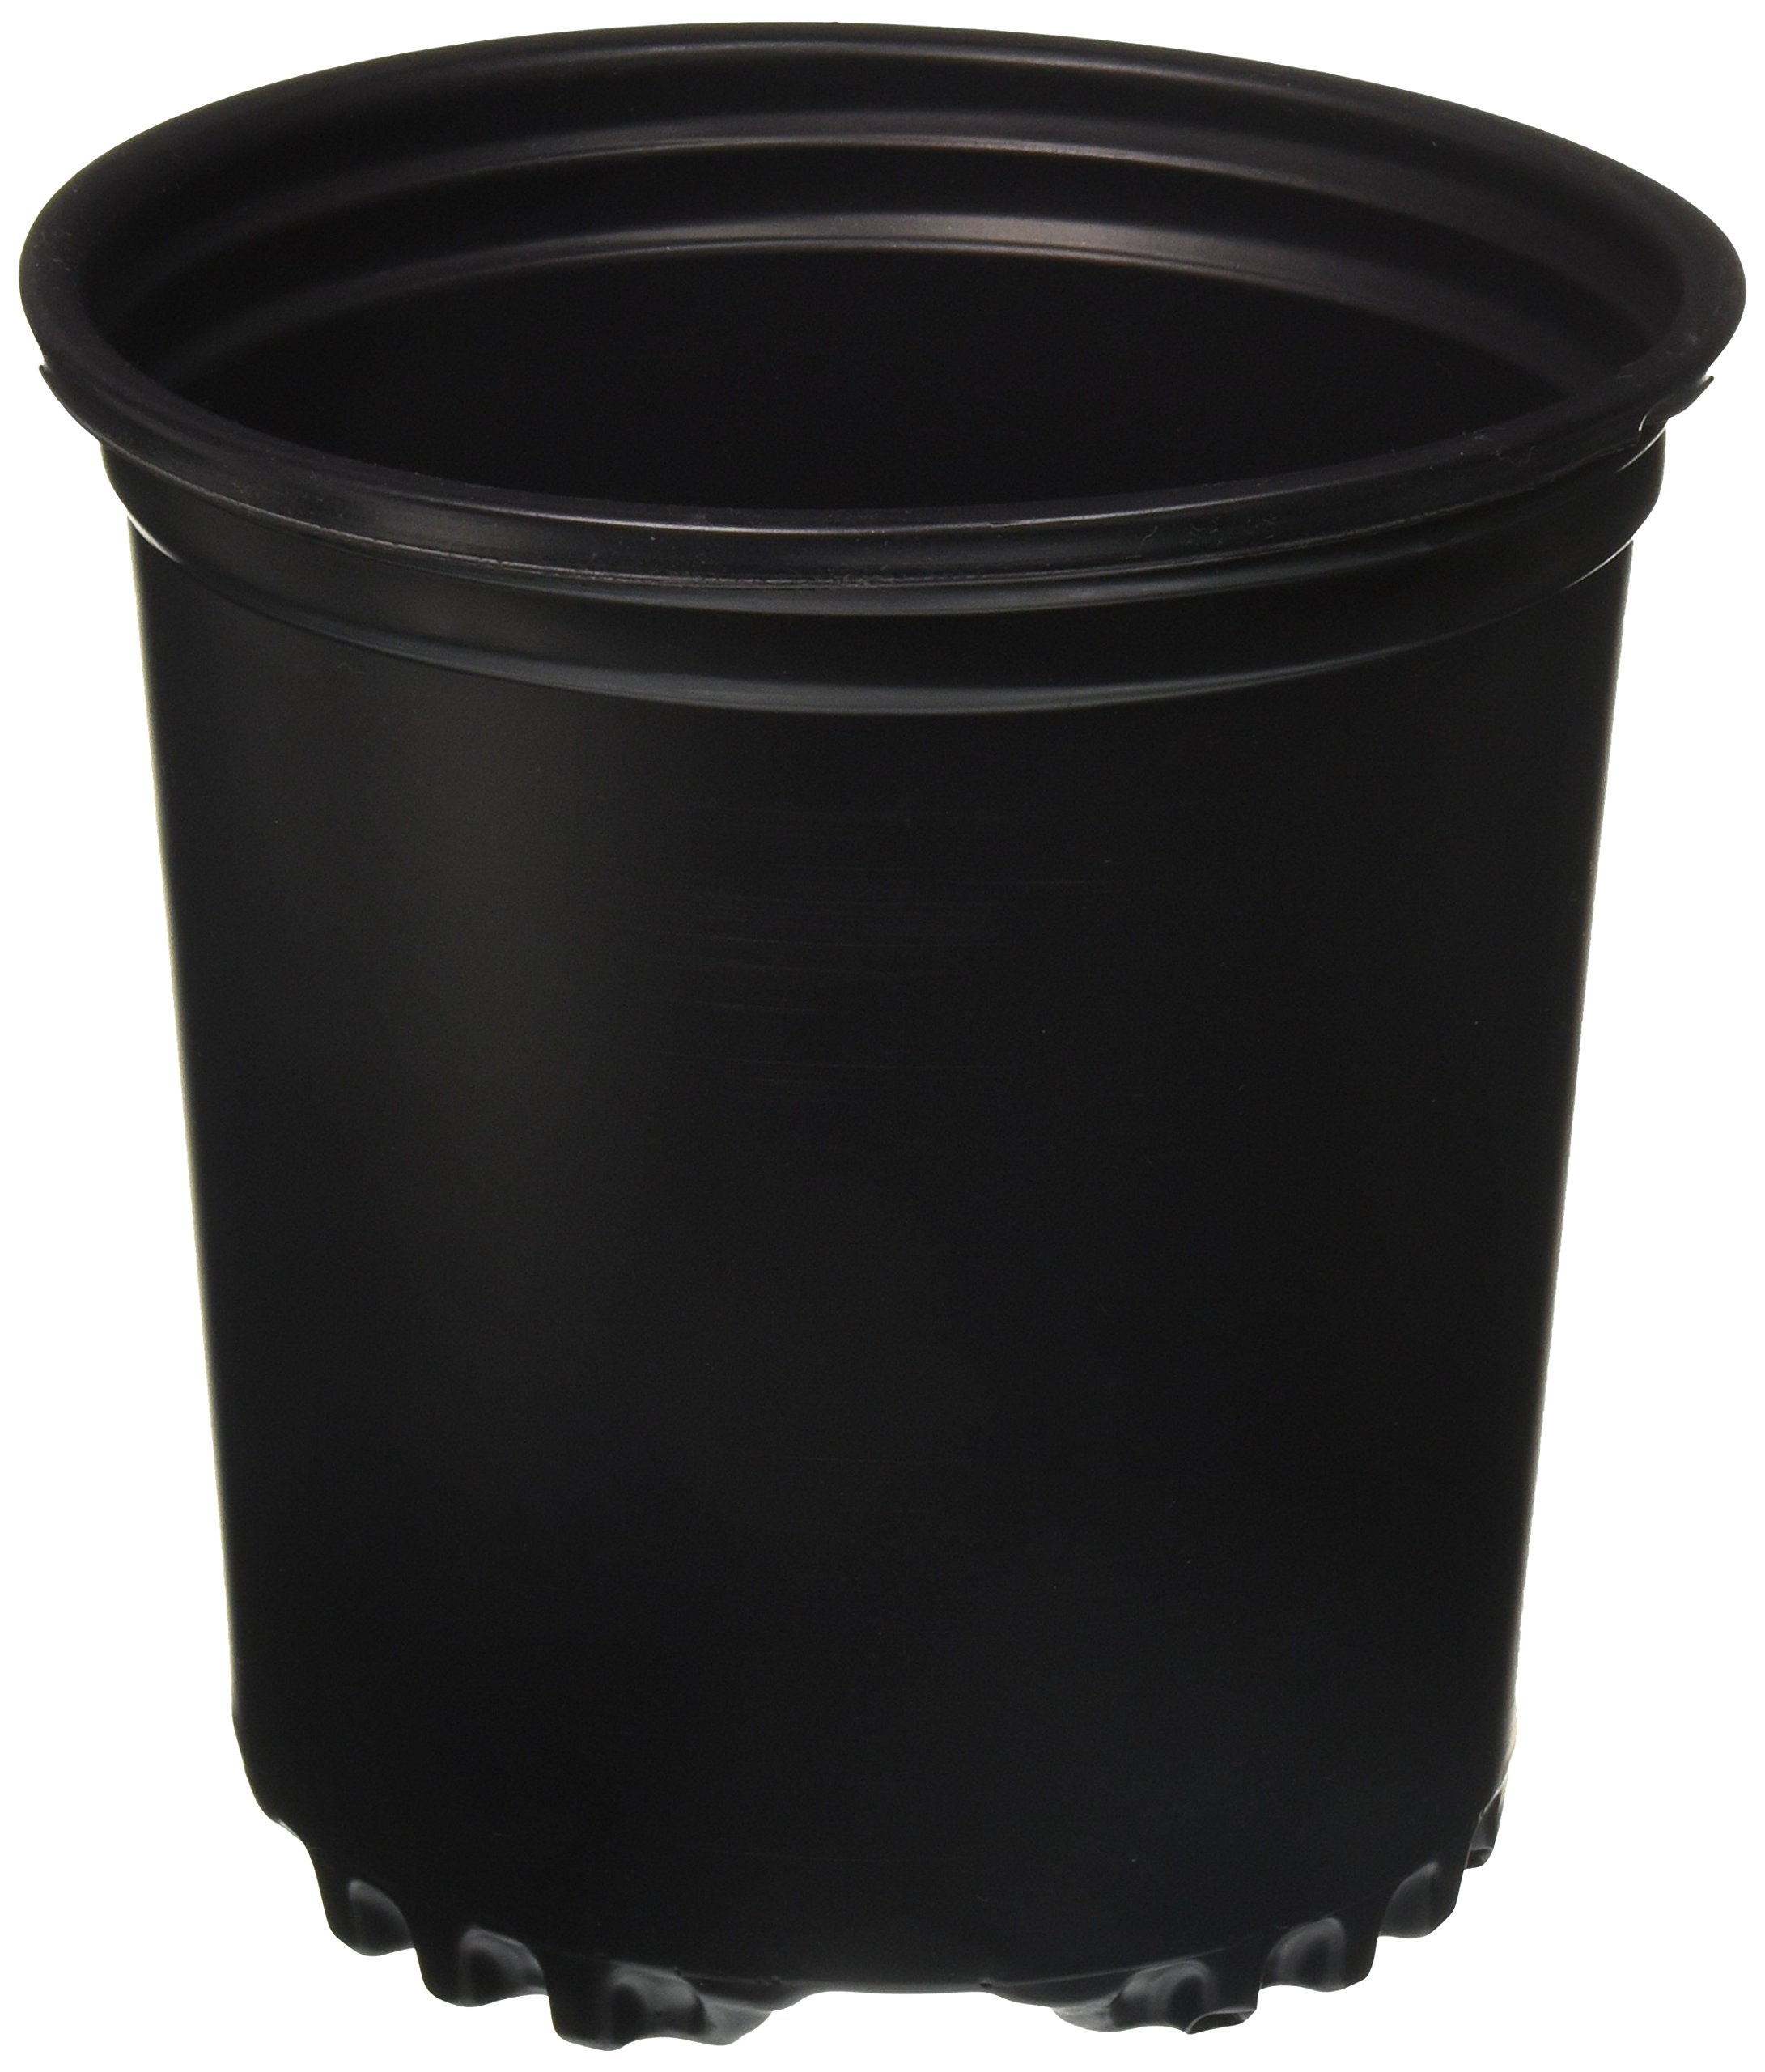 Viagrow 3 gallon - Nursery Pot, 20 pack ( 11.36 liters) Trade Gallon by Viagrow